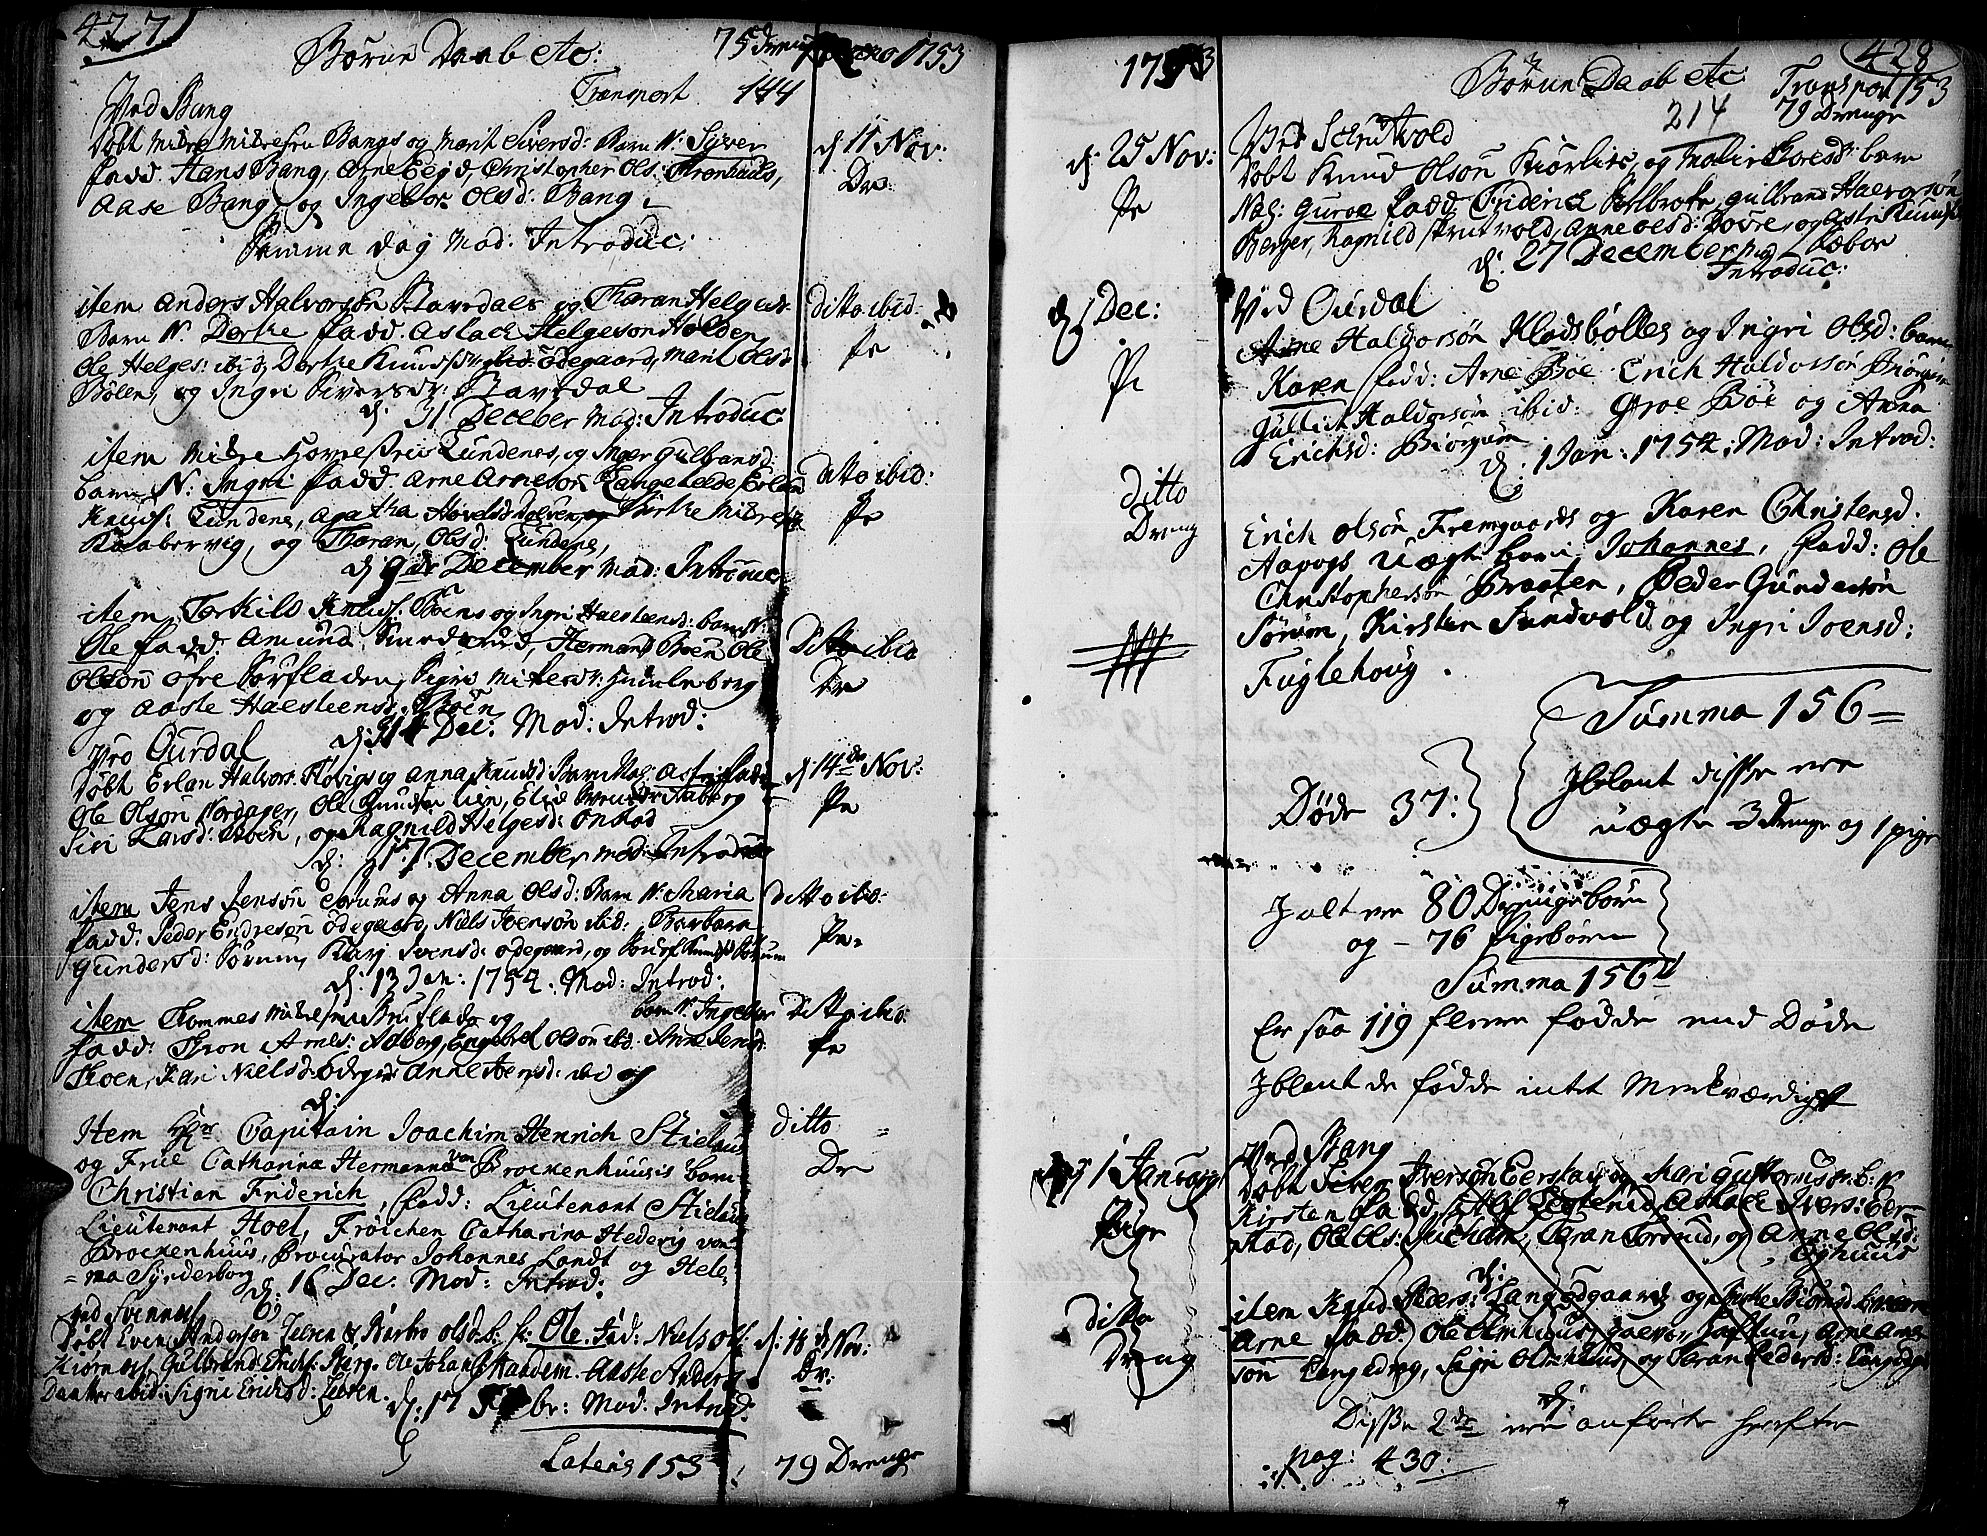 SAH, Aurdal prestekontor, Ministerialbok nr. 4, 1730-1762, s. 427-428